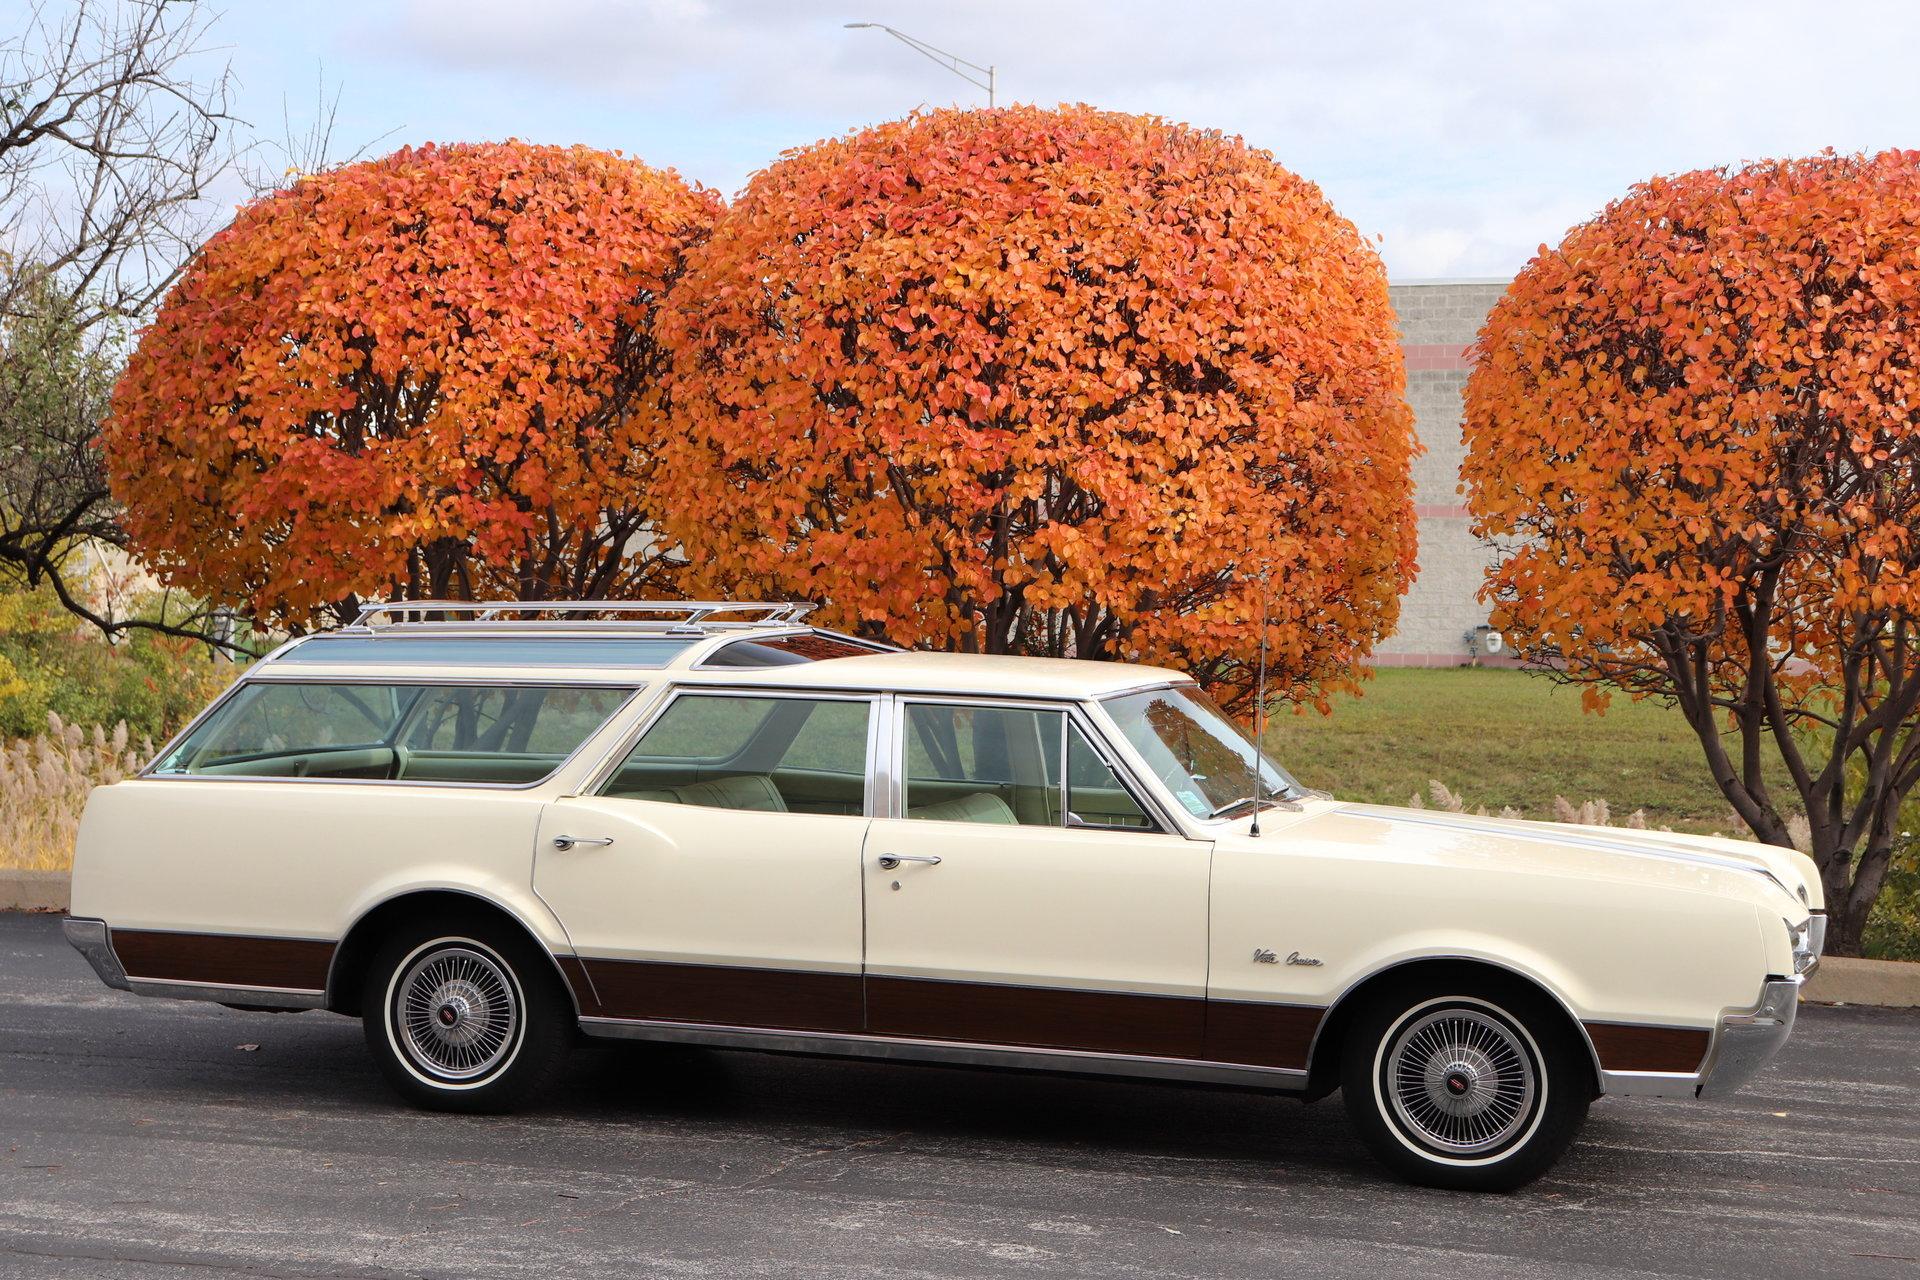 468846b8656d5 hd 1967 oldsmobile vista cruiser